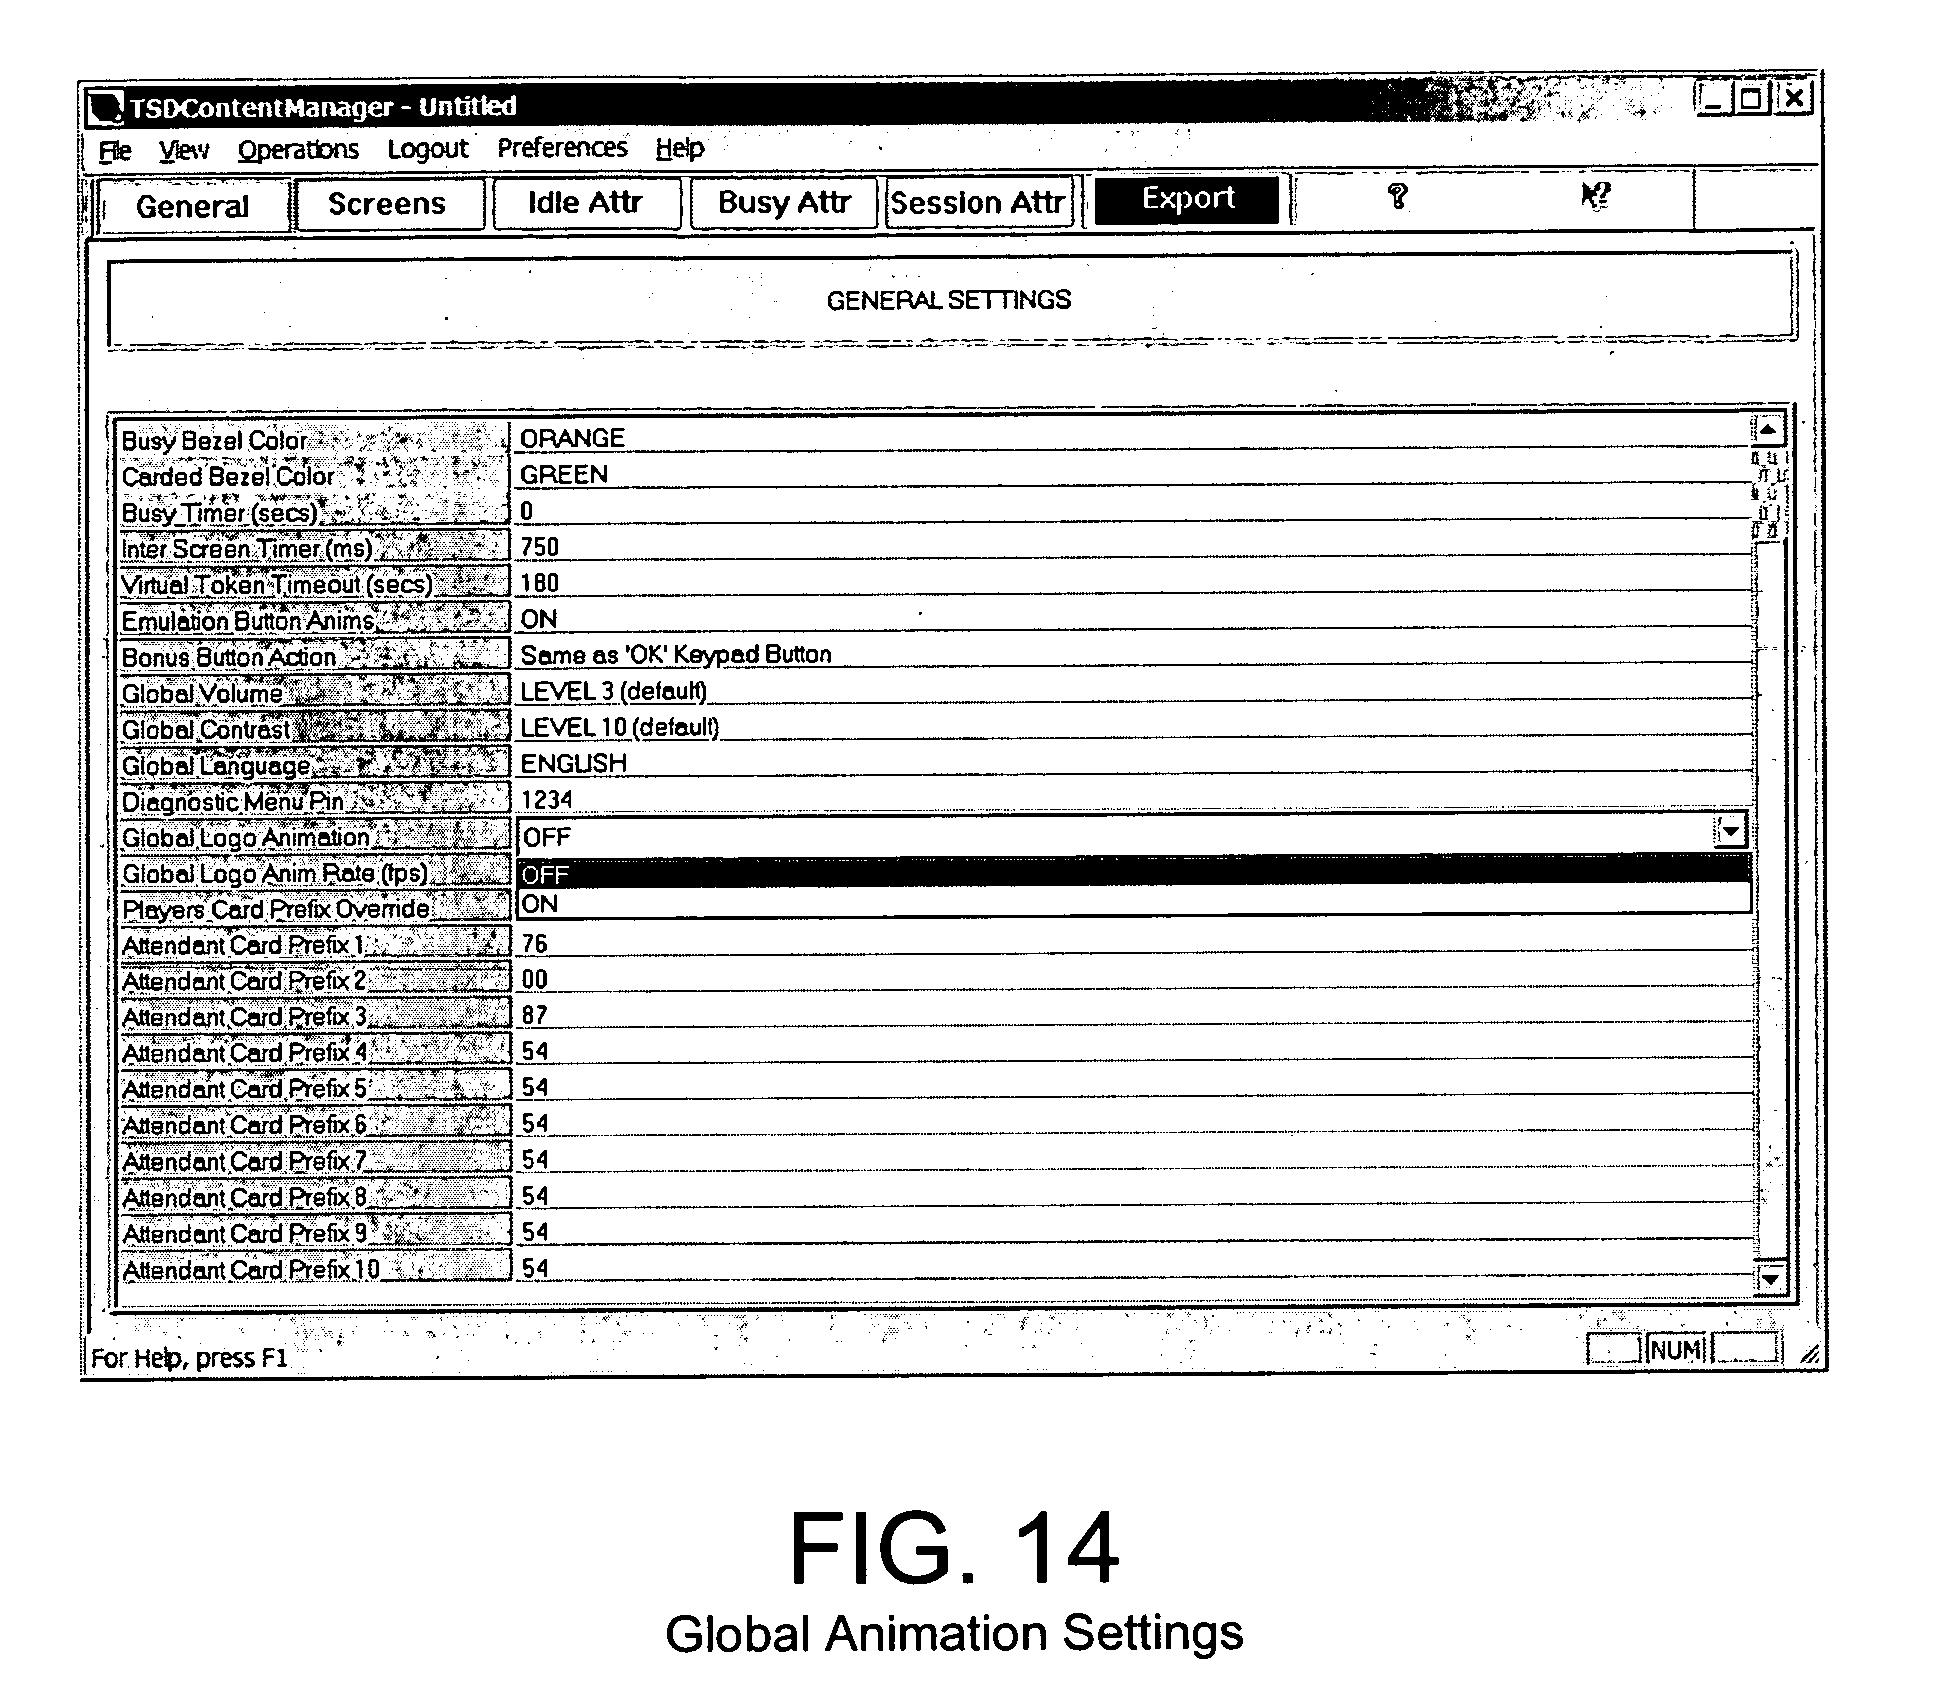 Patent US 7,473,178 B2